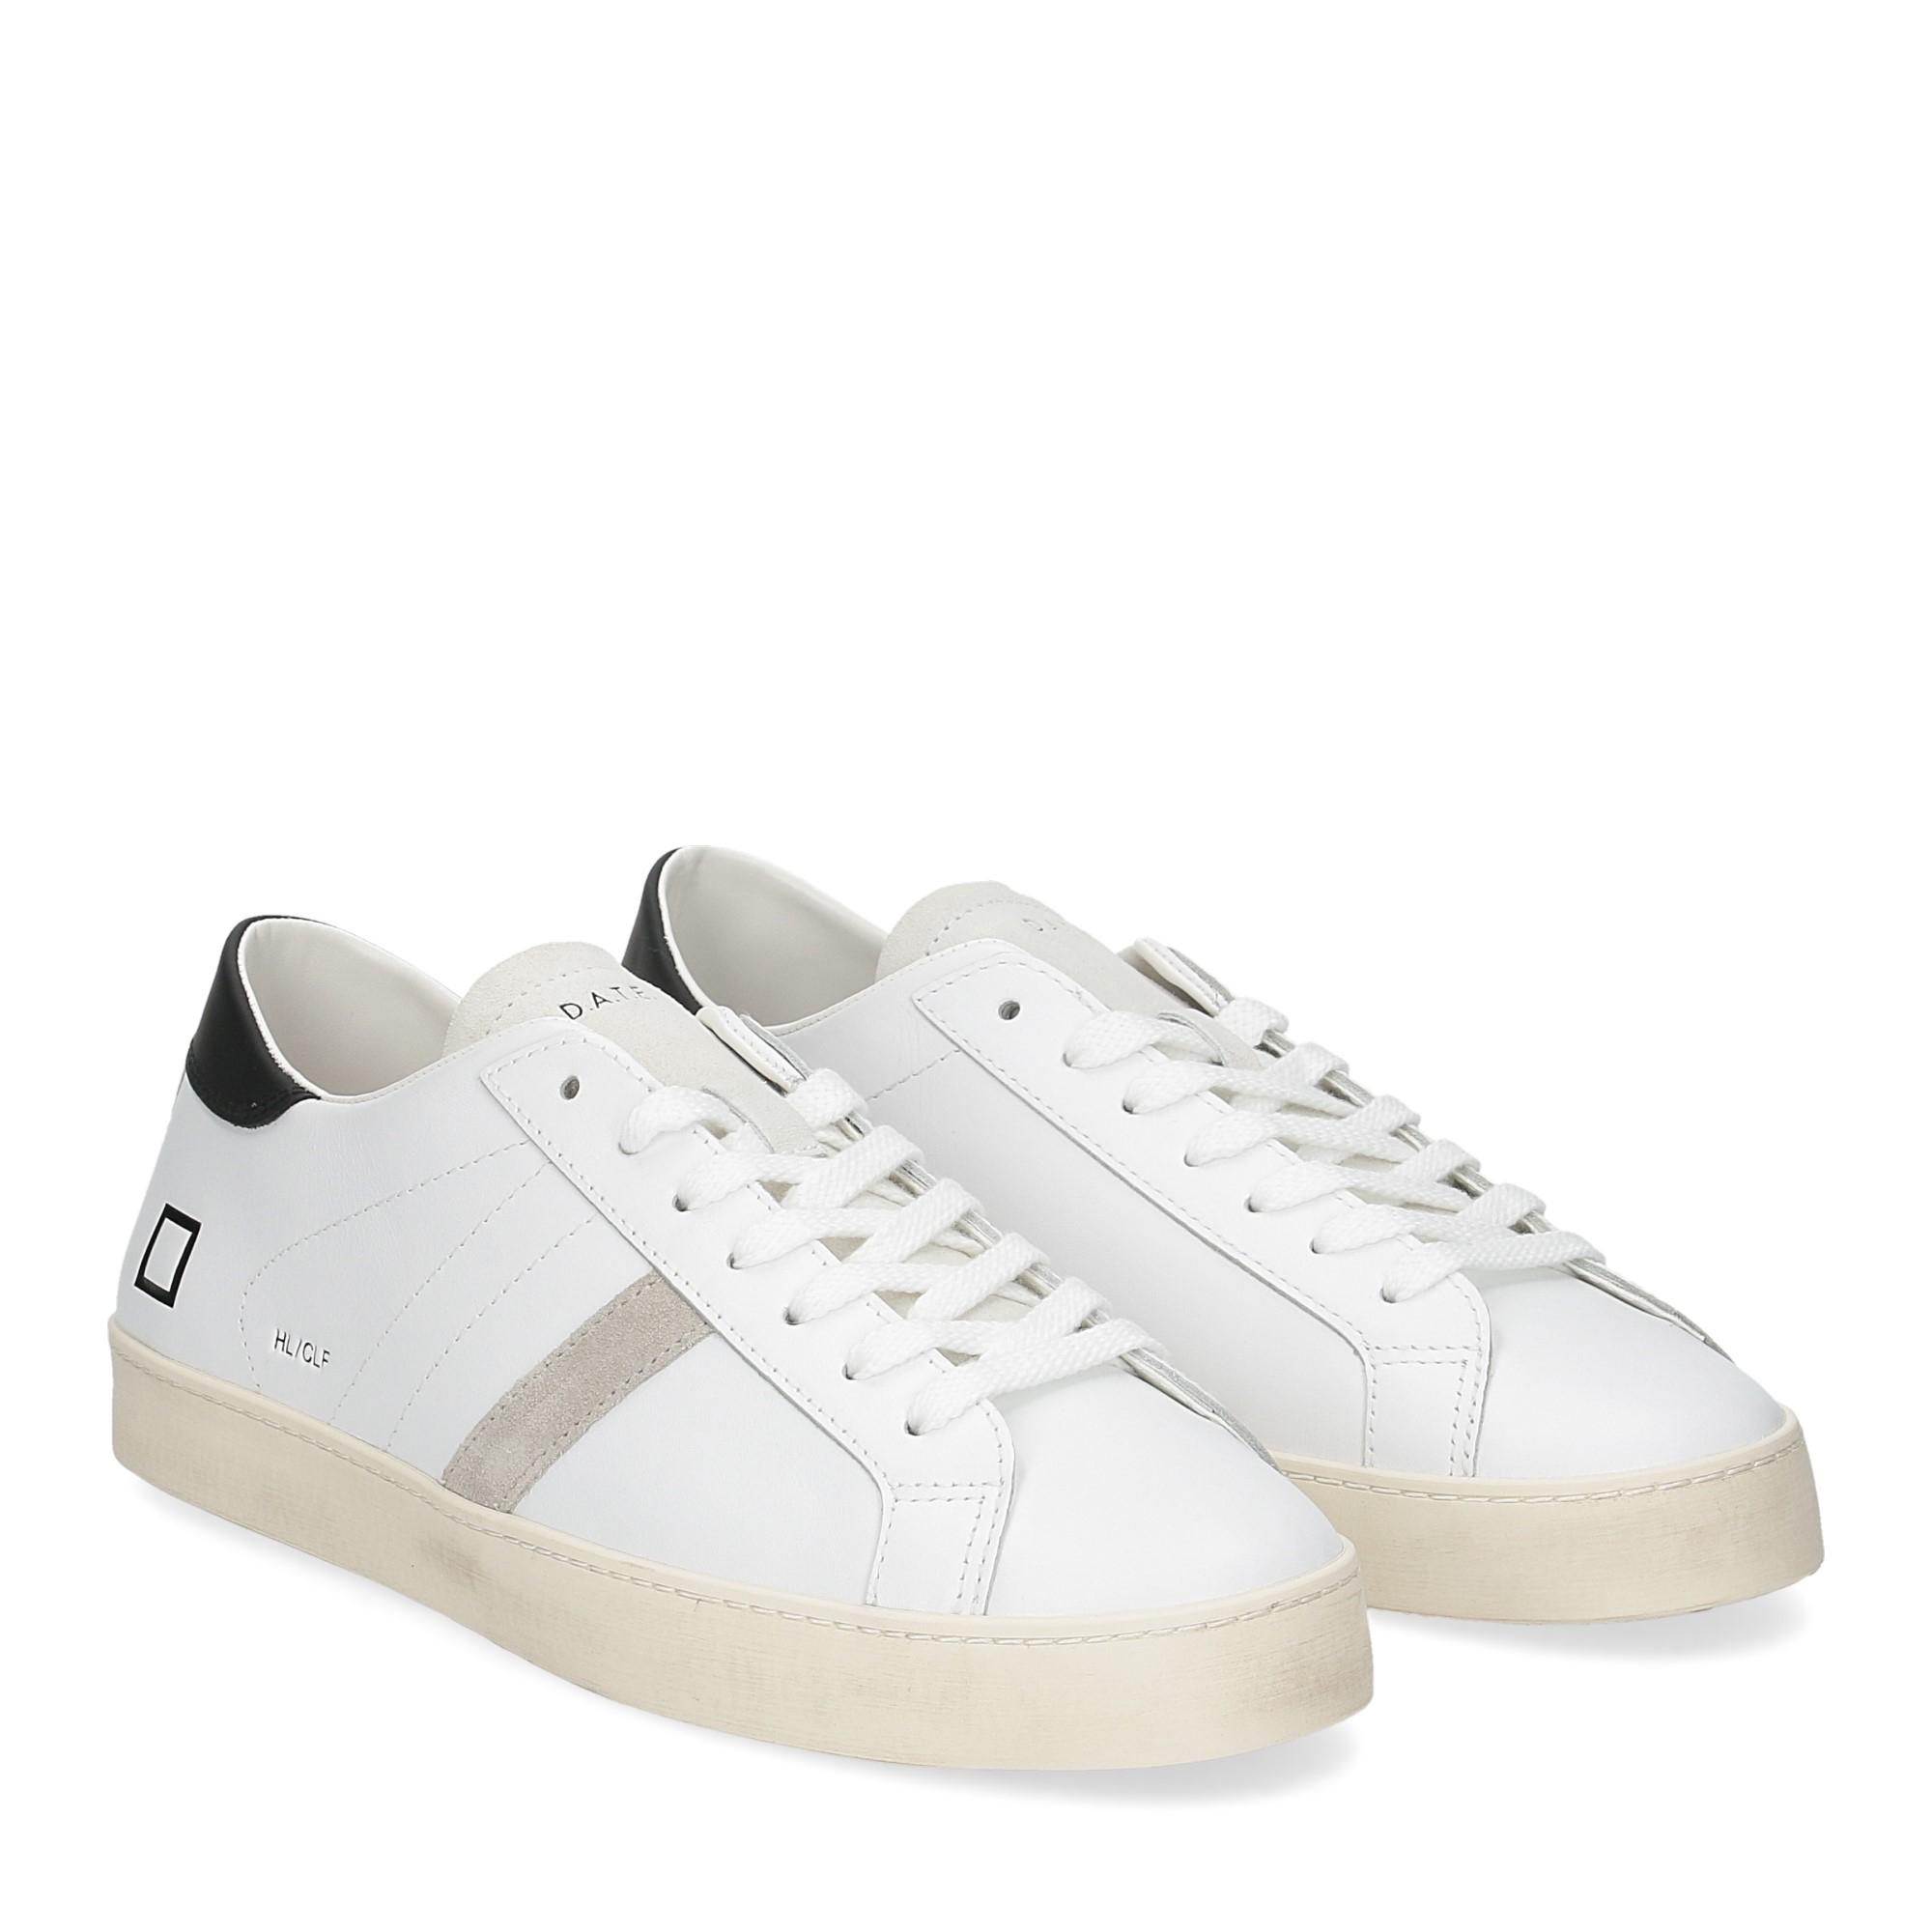 D.A.T.E. Hill low calf white black